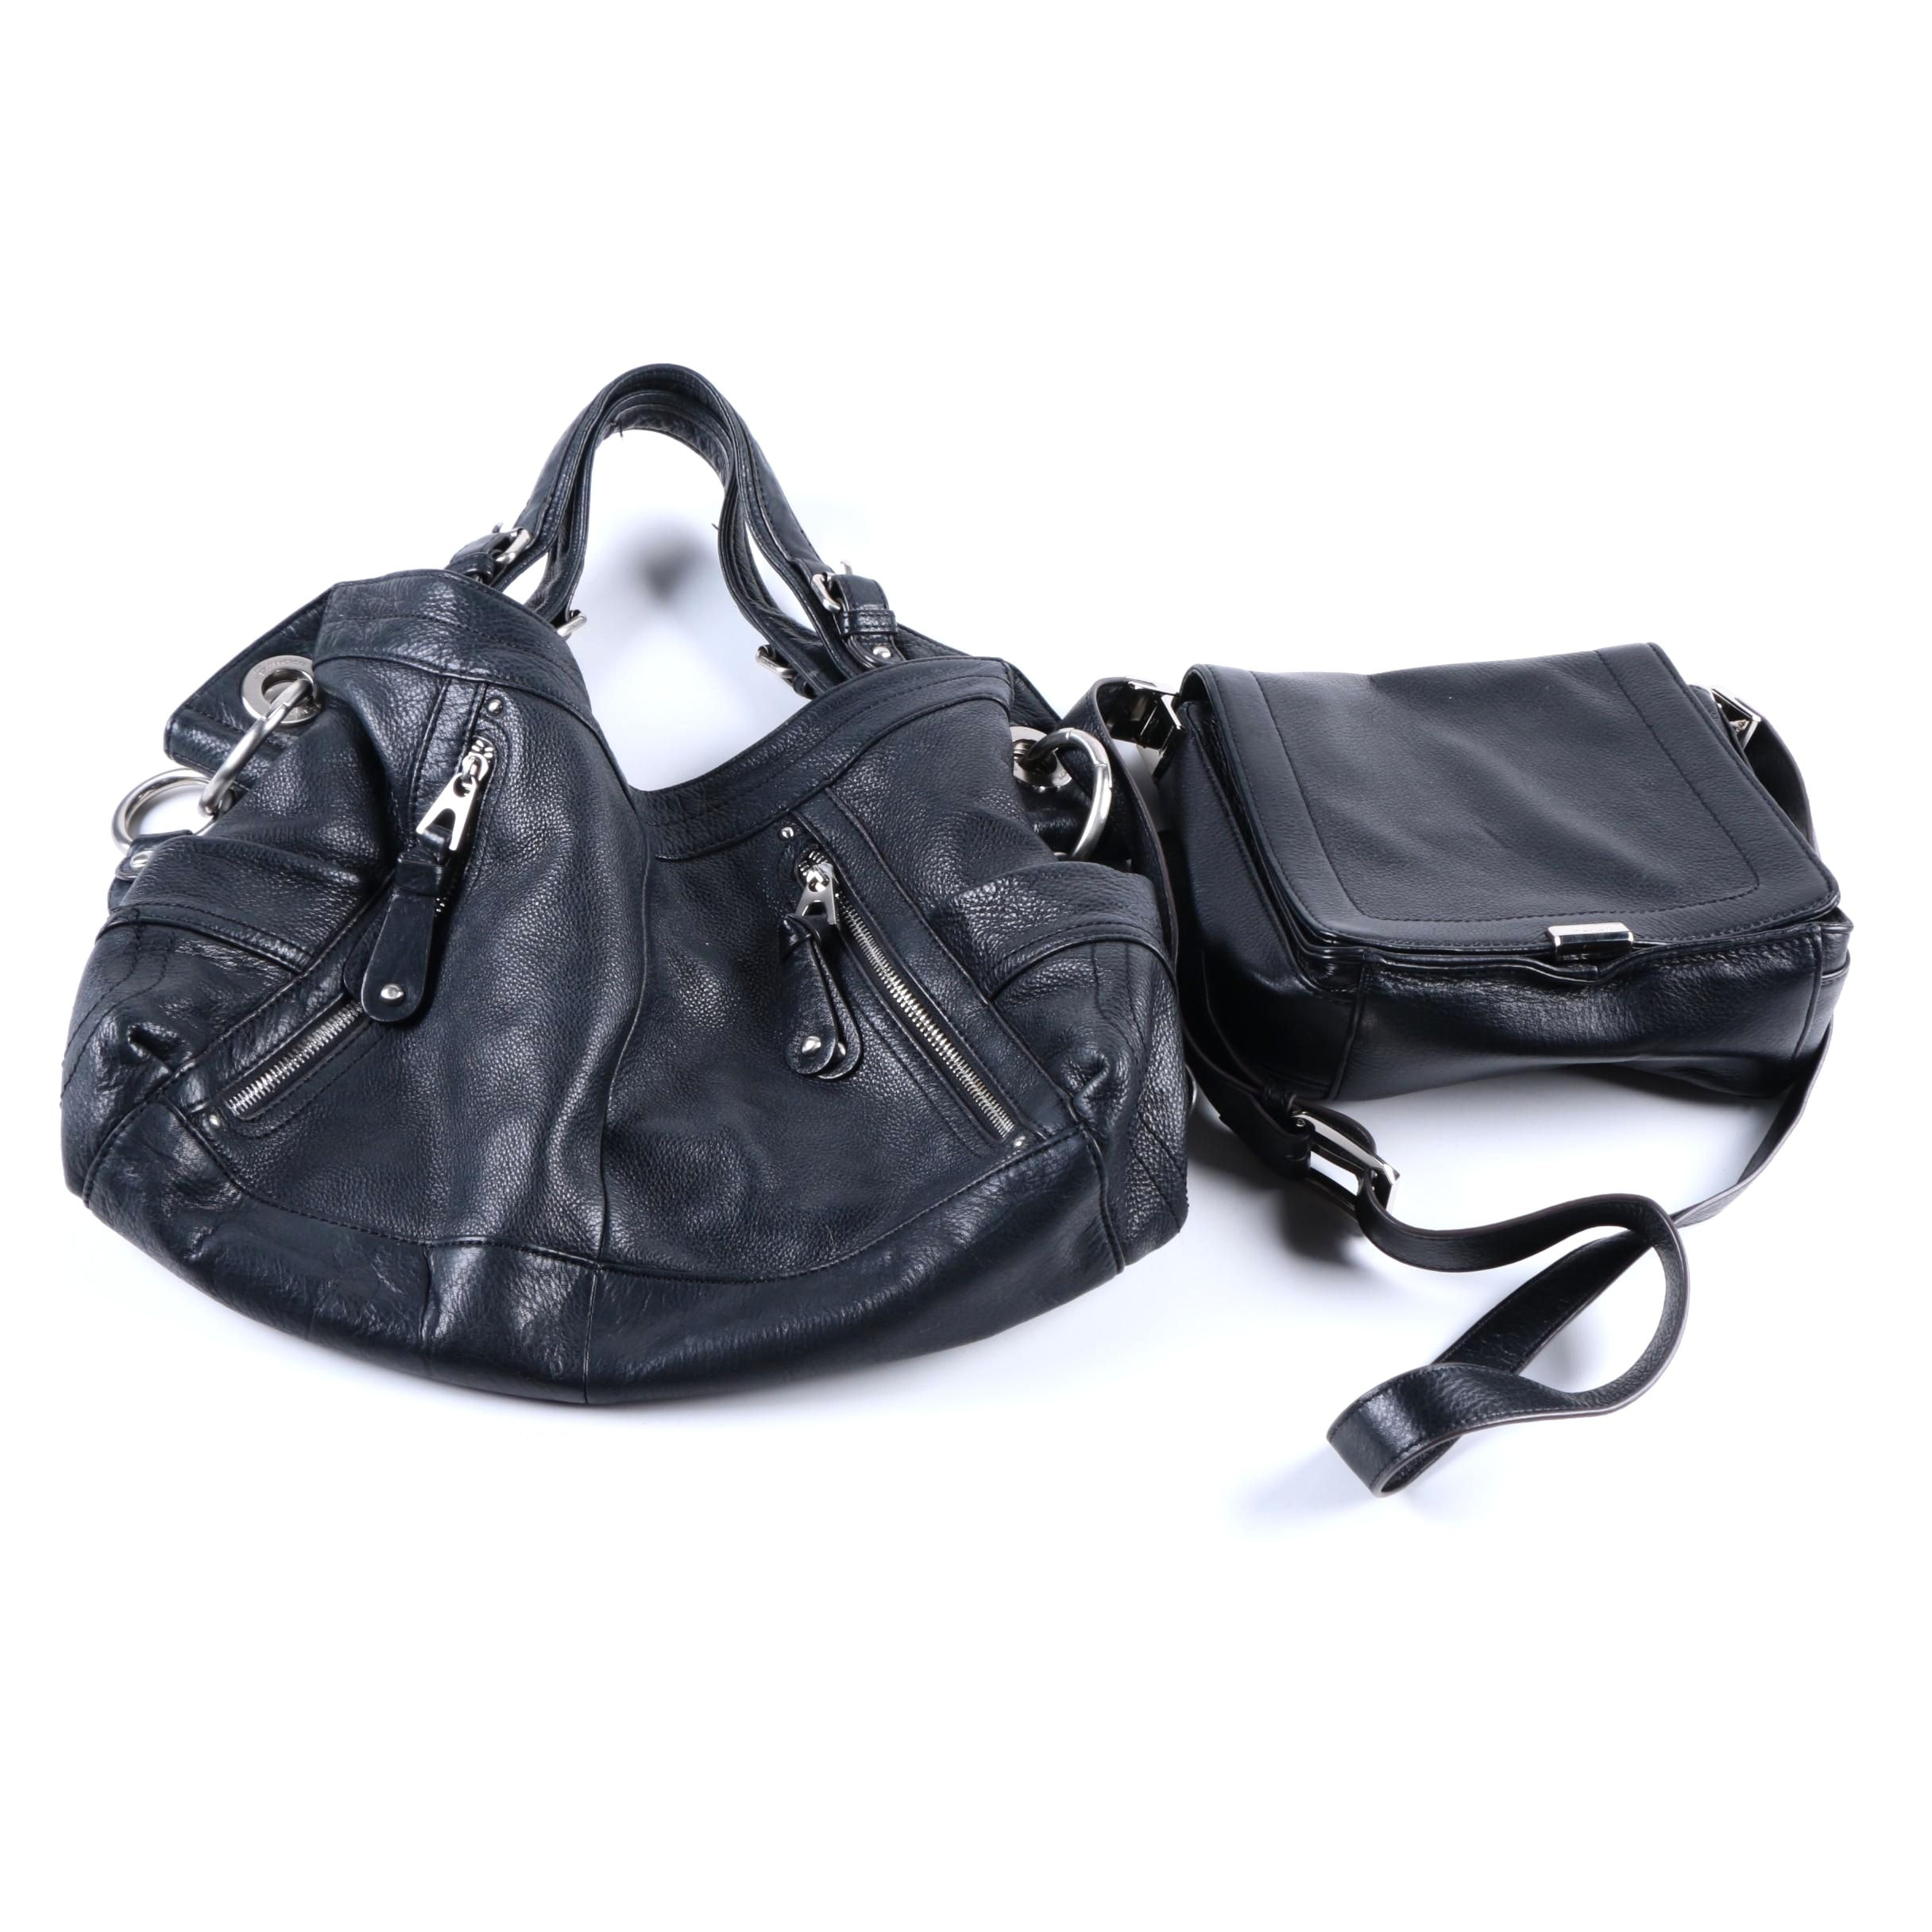 B. Makowski Black Leather Handbags